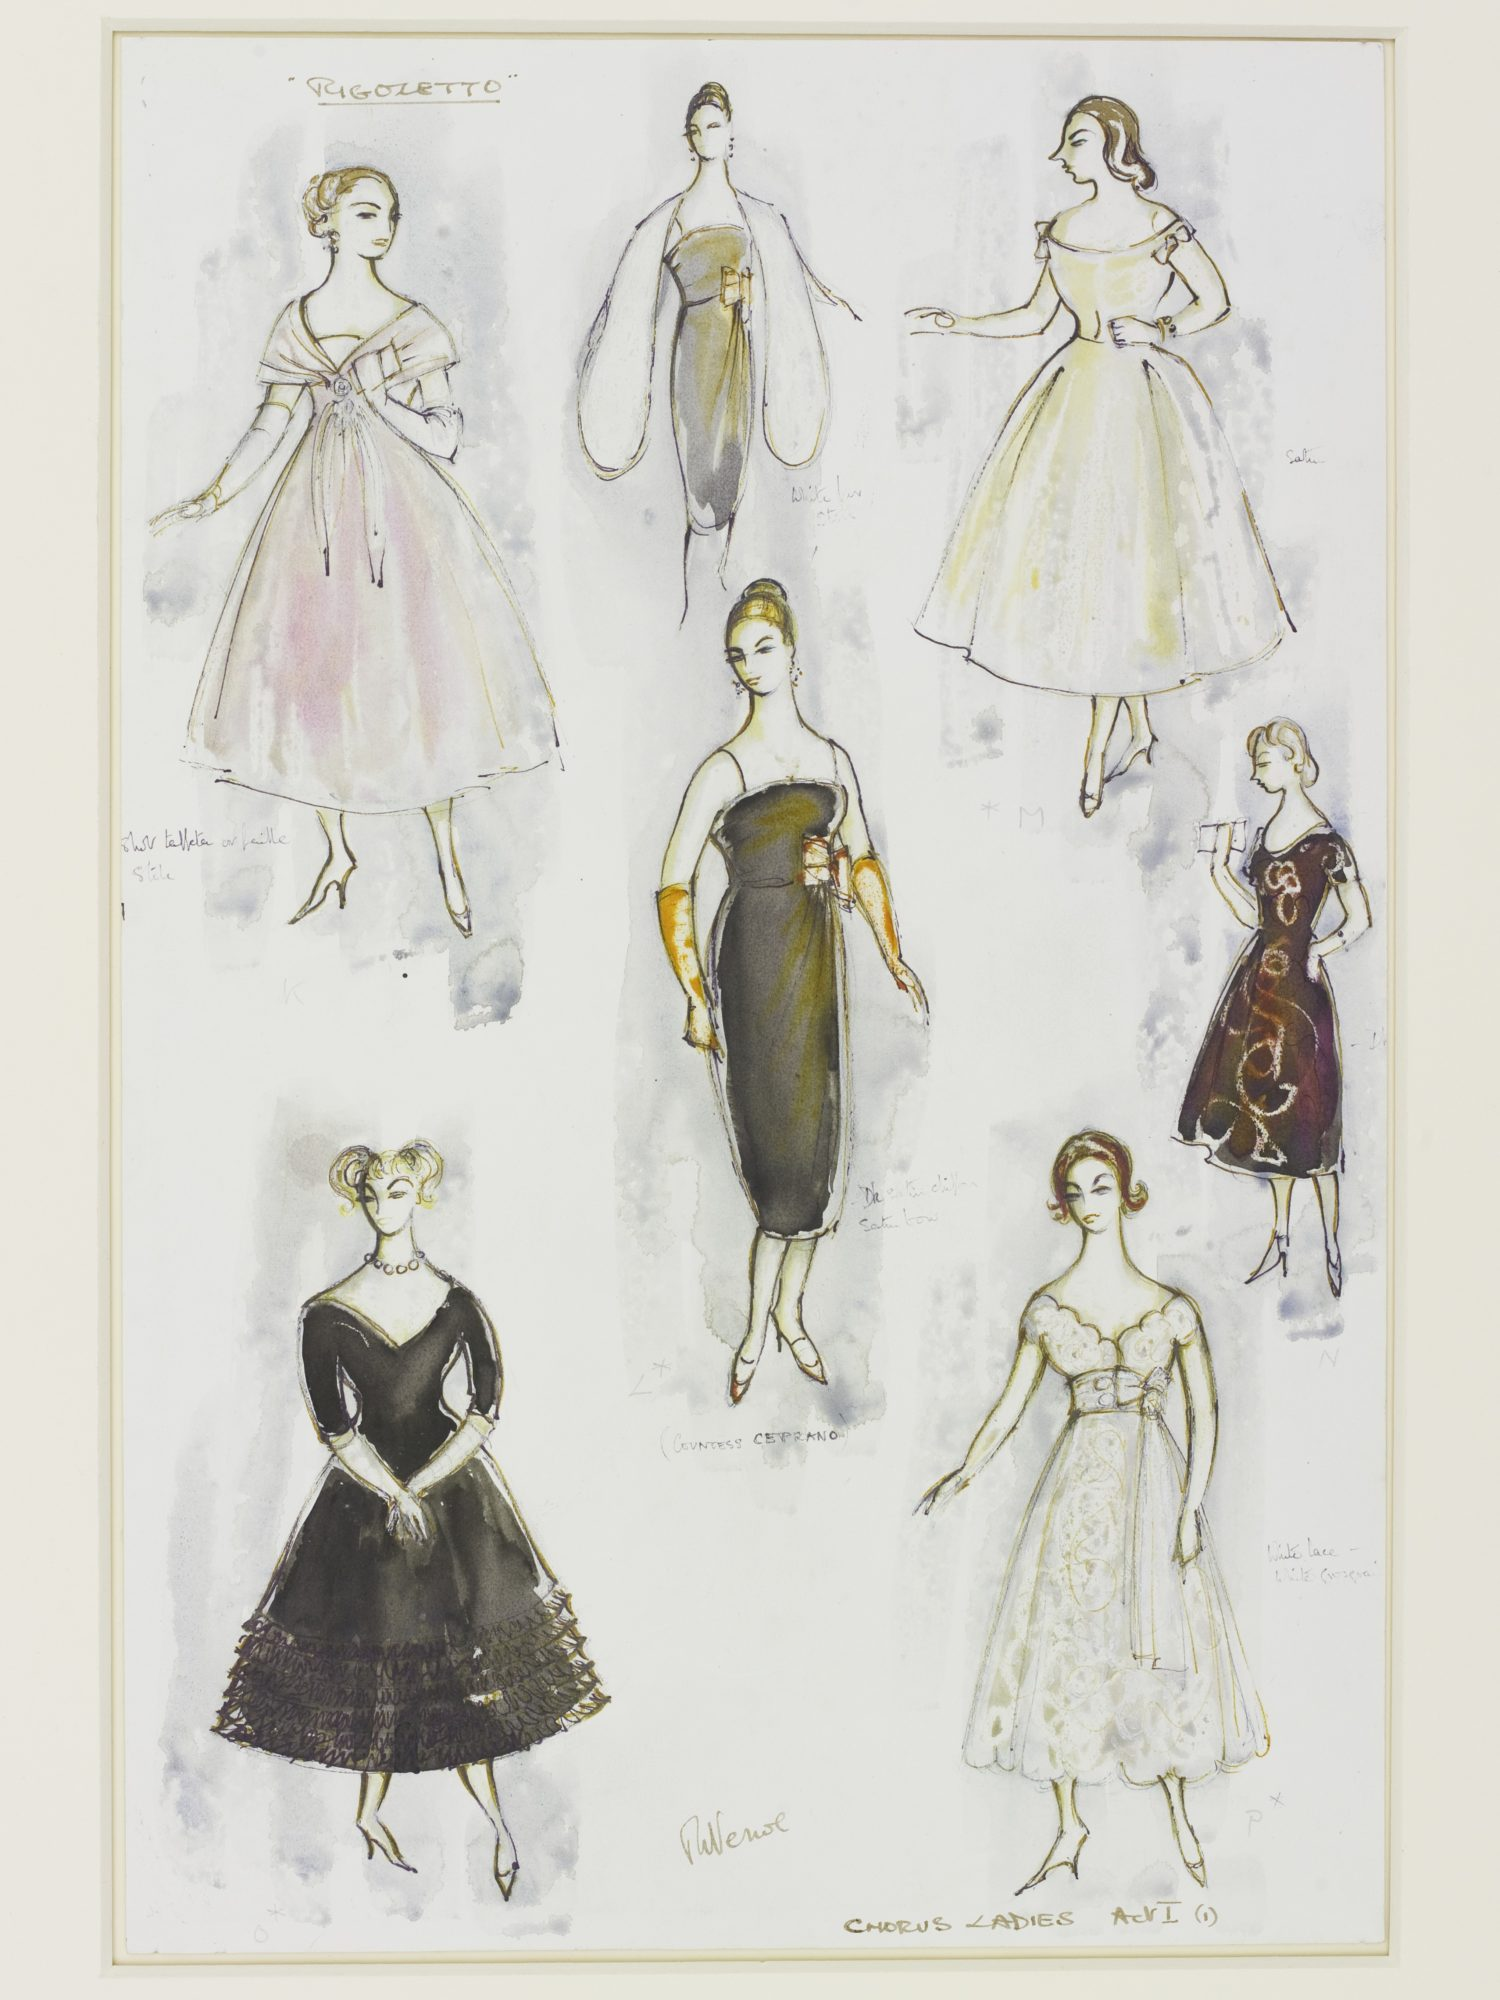 Costume Design for the Ladies Chorus in Rigoletto, 1982 Designed by Rosemary Vercoe